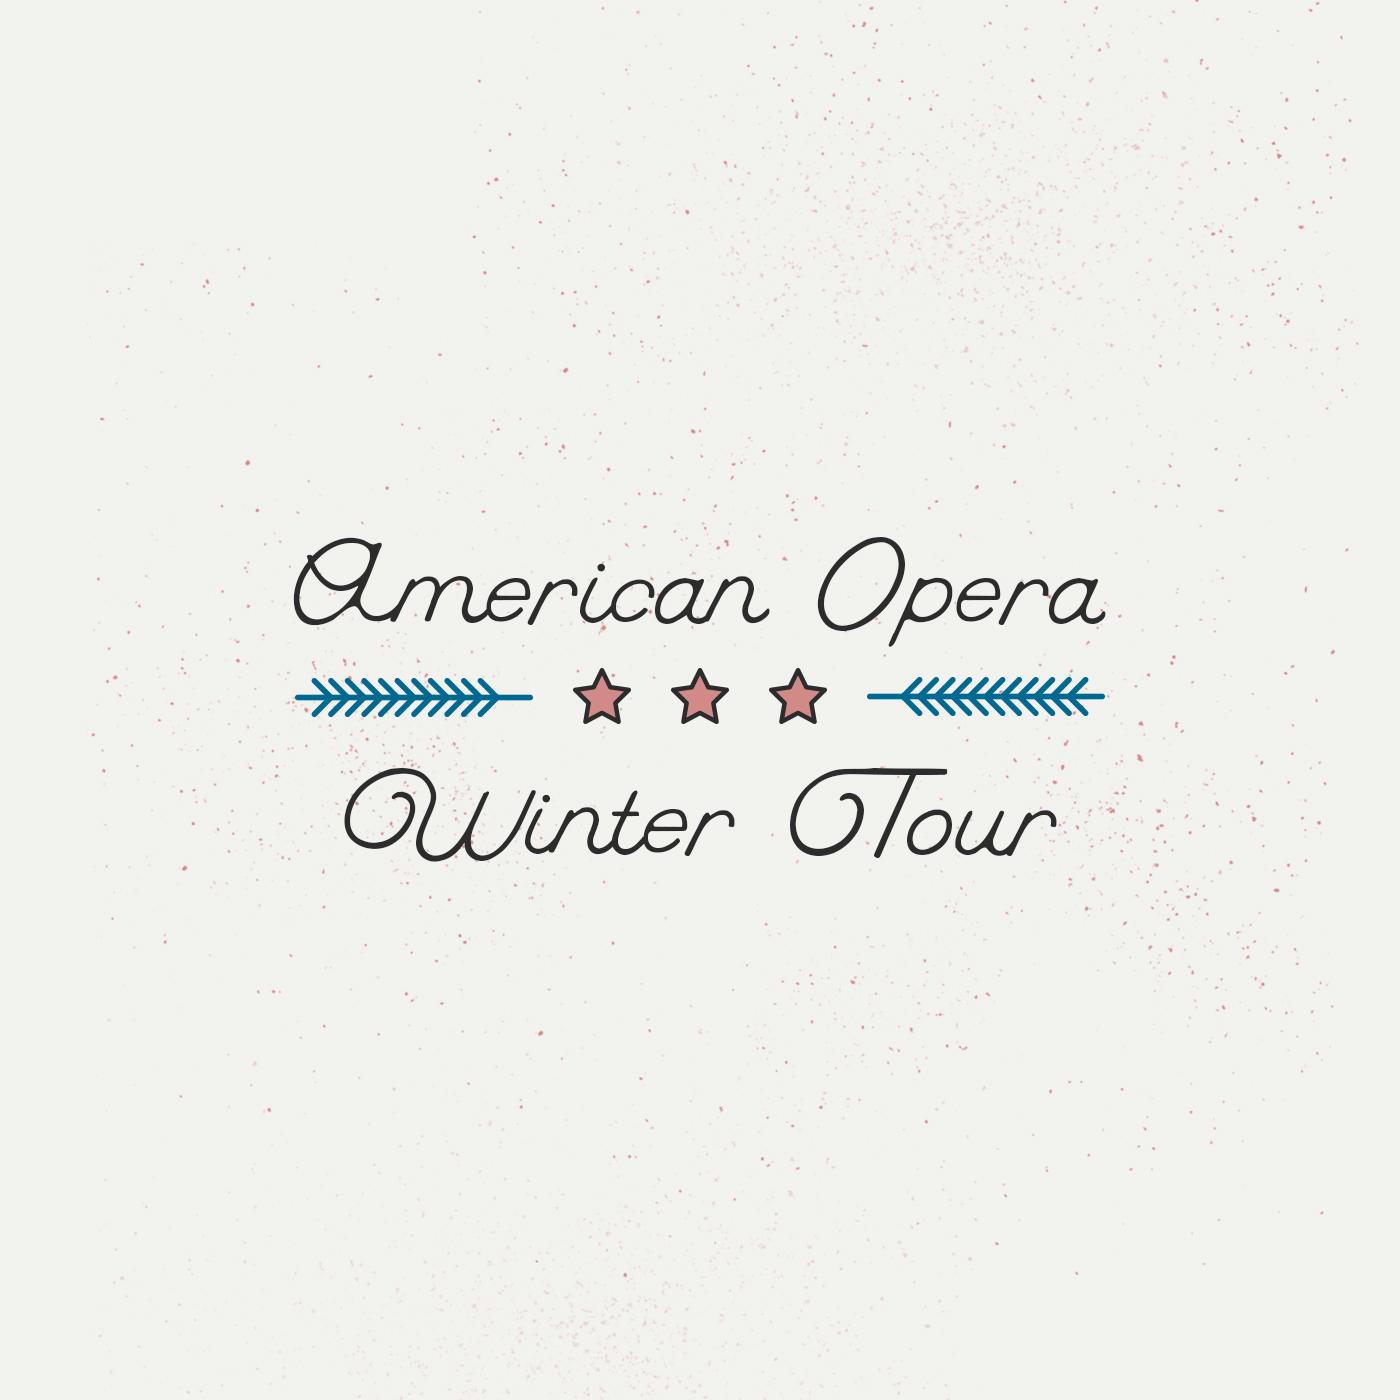 American-Opera_Winter-Tour_Hero_v2.jpg